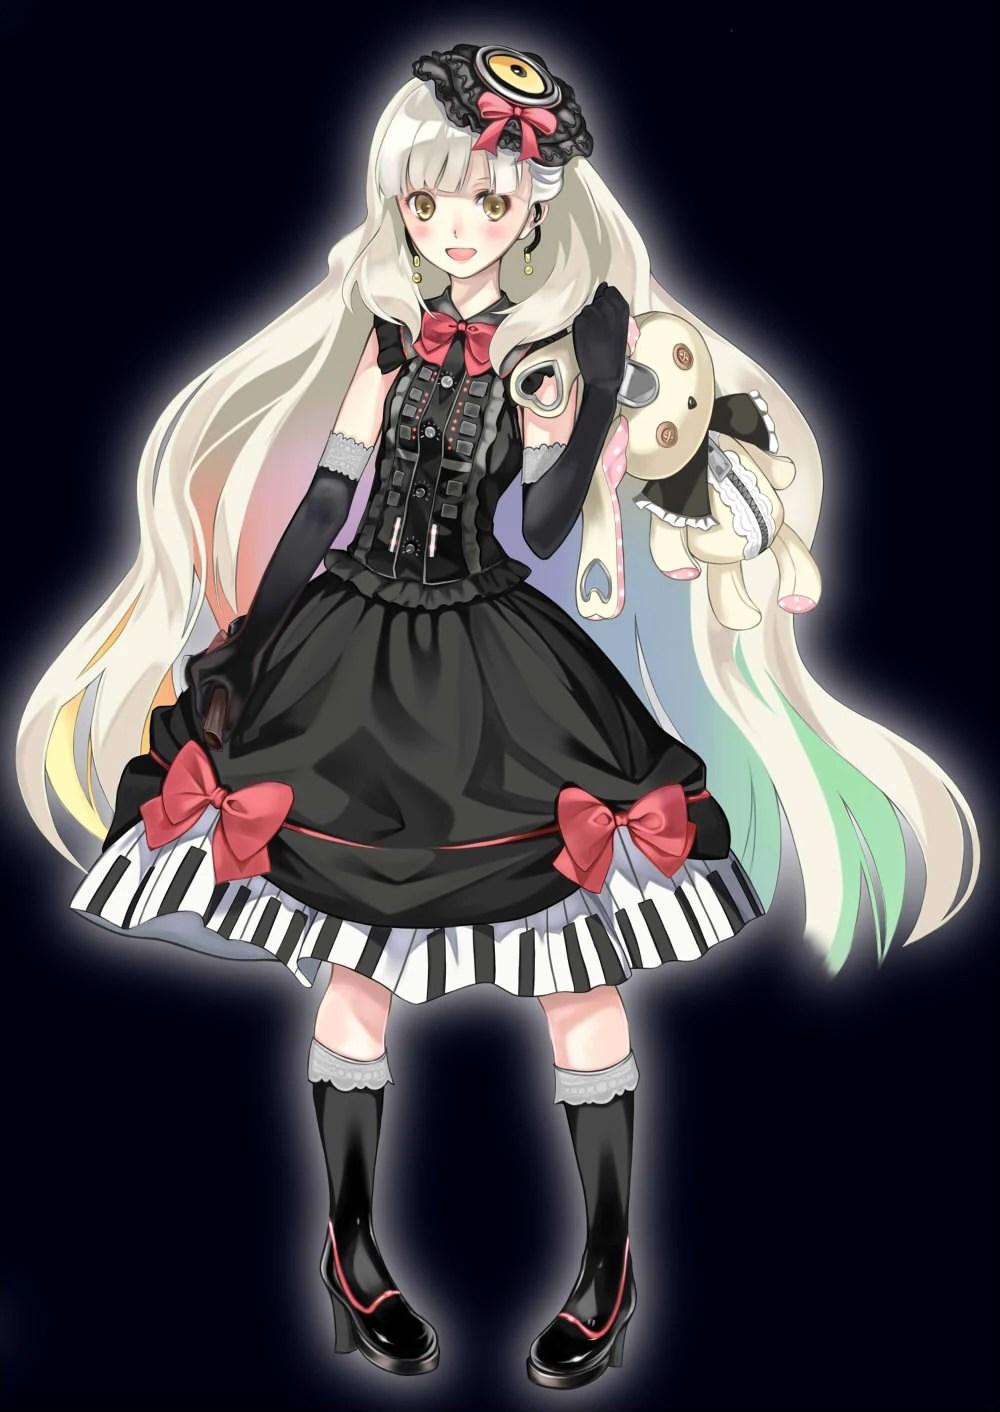 Yandere Anime Girl Wallpaper Mayu Vocaloid Italia Wiki